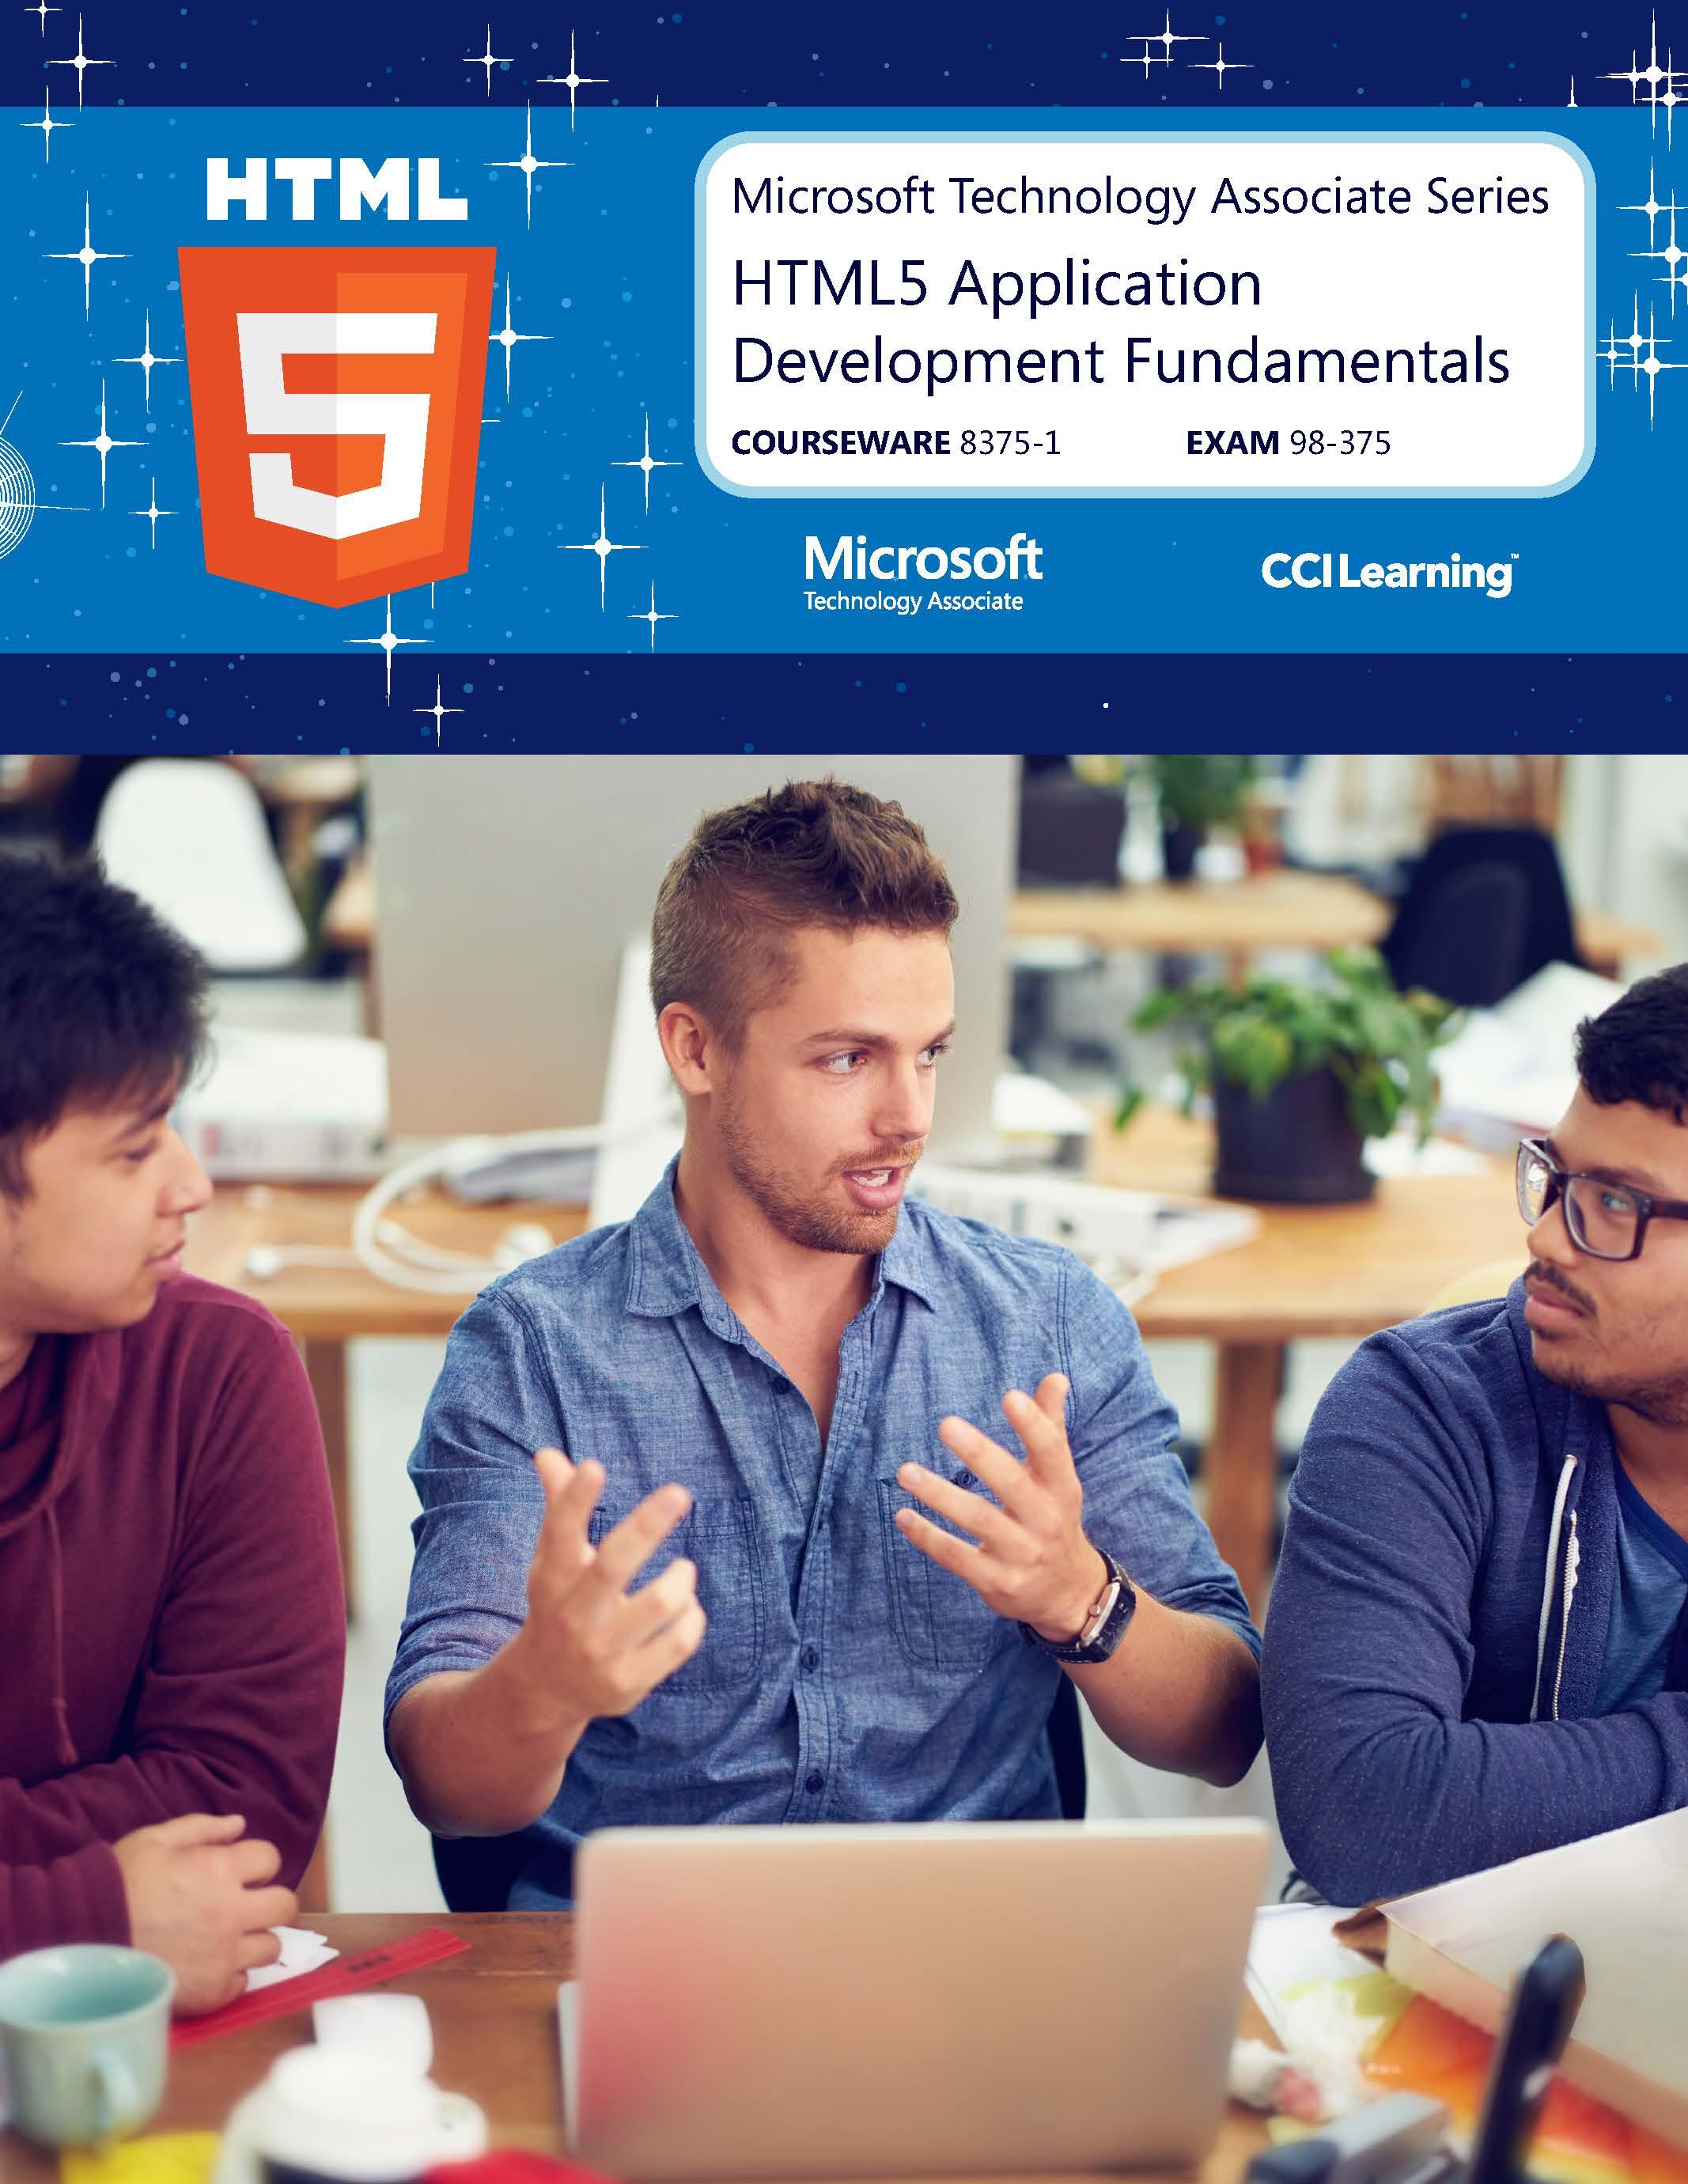 HTML5 App Developer Fundamentals